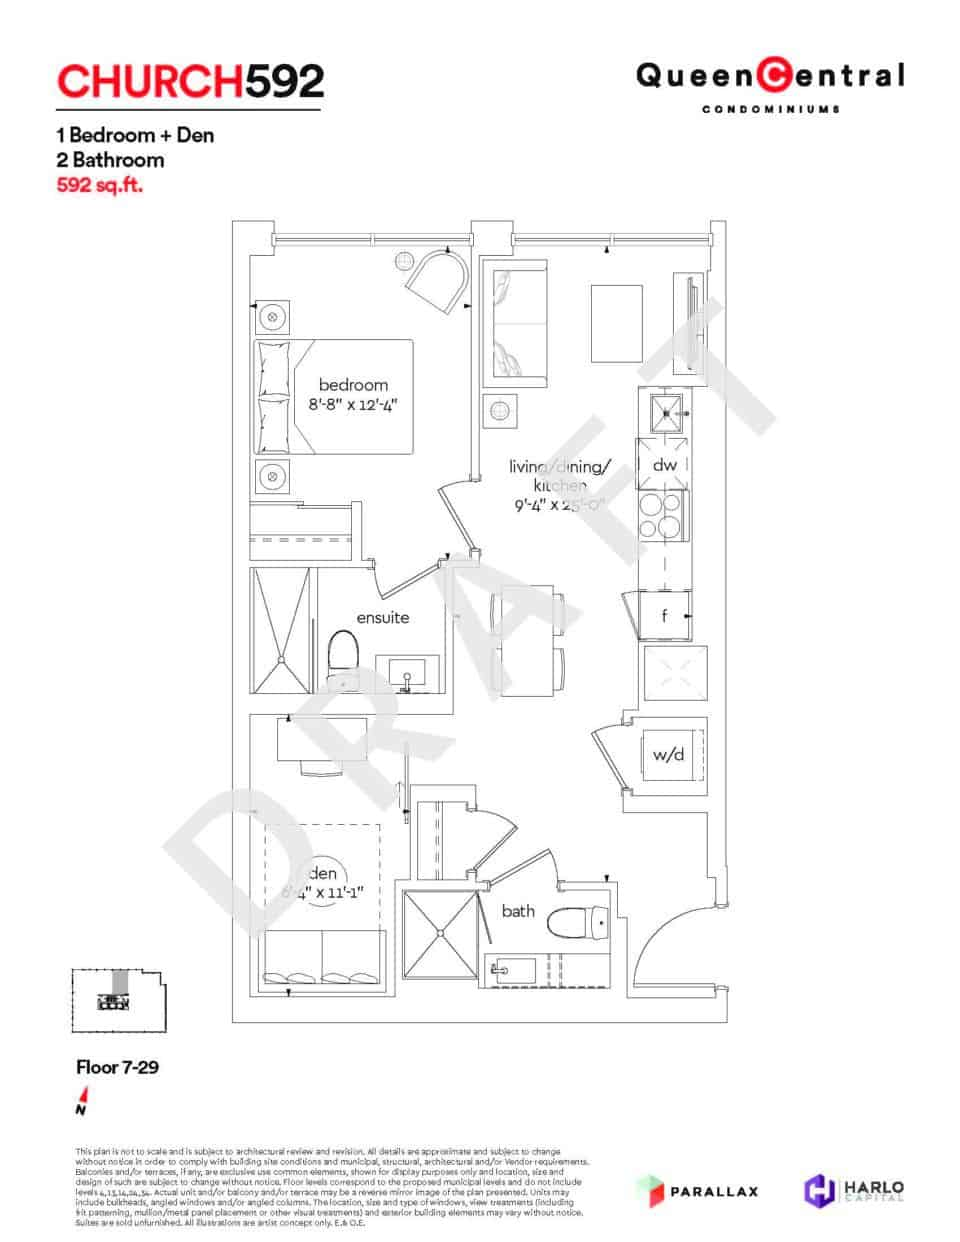 Queen Central Draft Floor Plans CHURCH 592